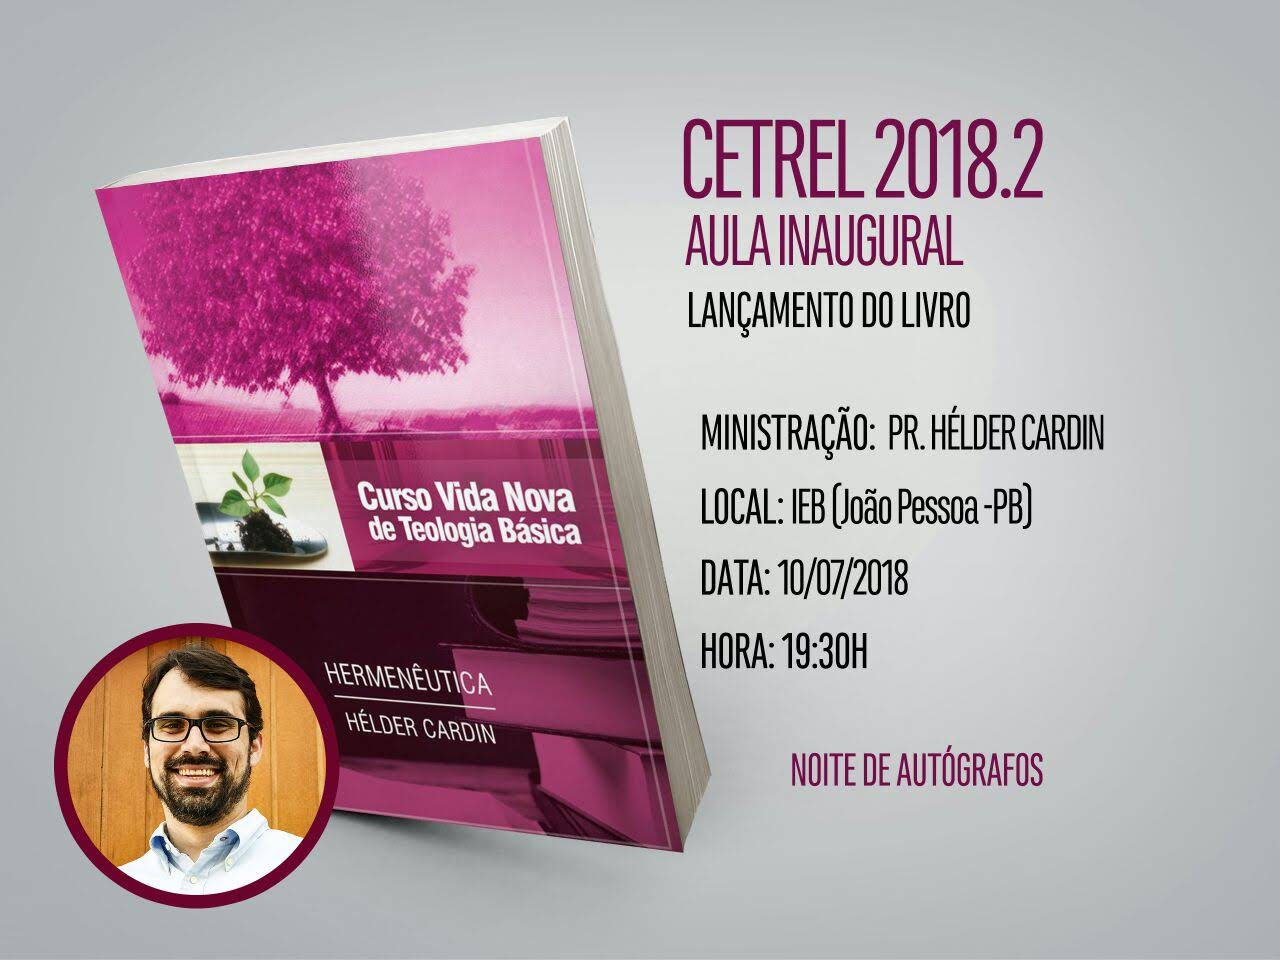 CETREL 2018.2 - AULA INAUGURAL 7